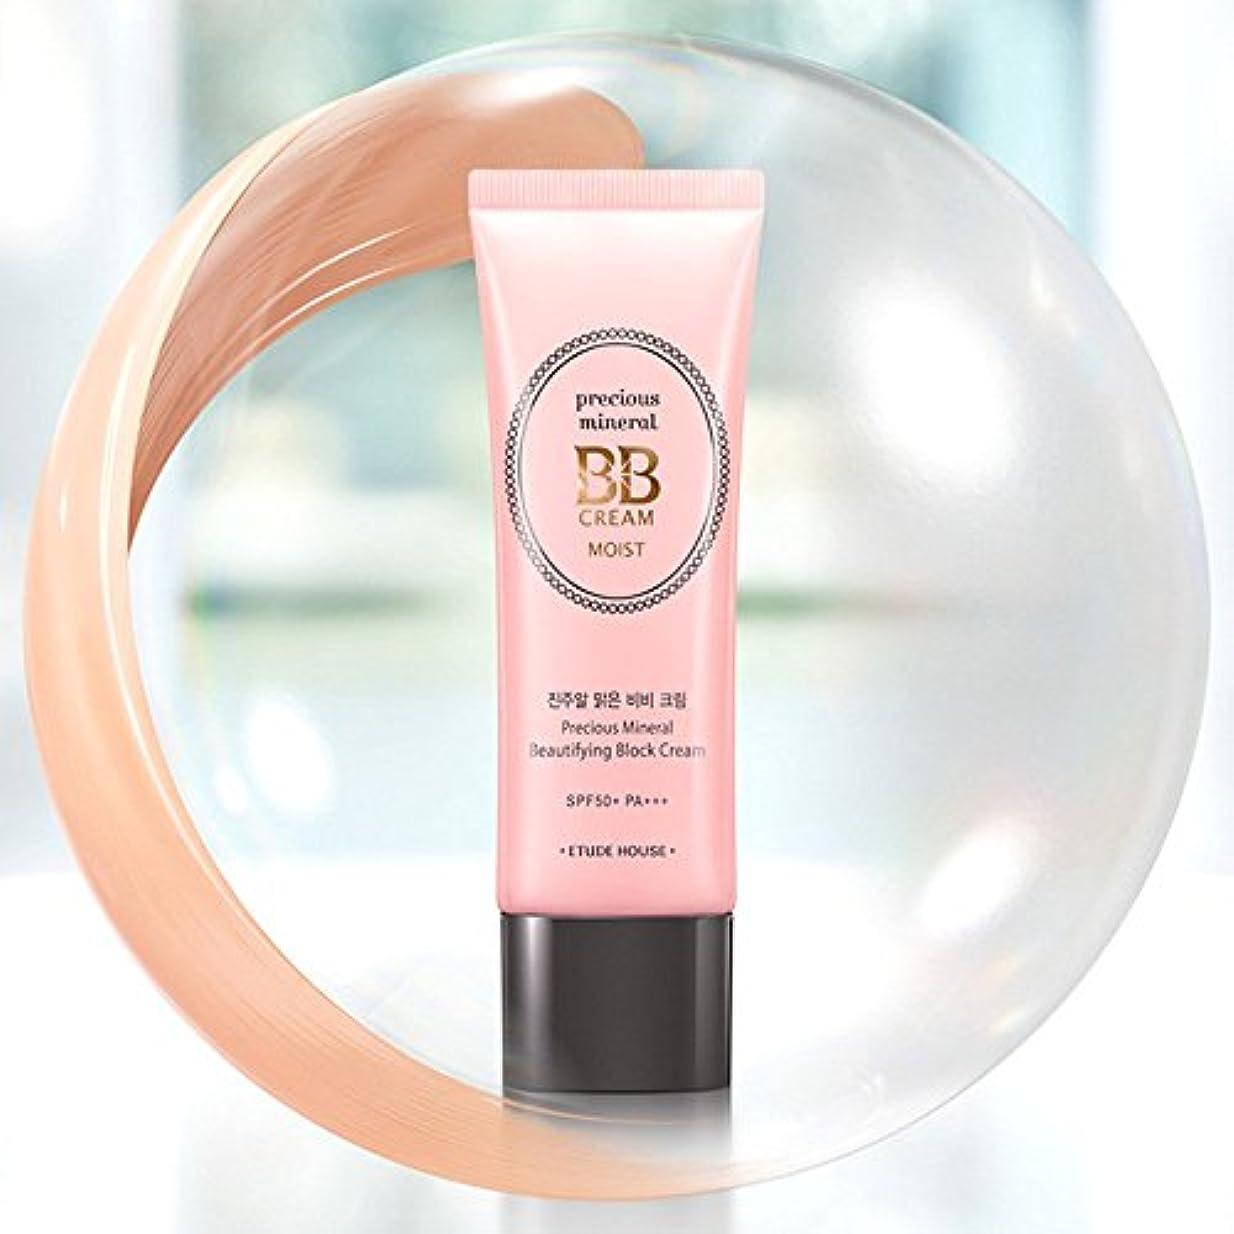 ETUDE HOUSE Precious Mineral BB Cream Moist [Vanilla] SPF50+ PA+++ エチュードハウス プレシャスミネラルBBクリーム モイスト [バニラ] SPF50 +...